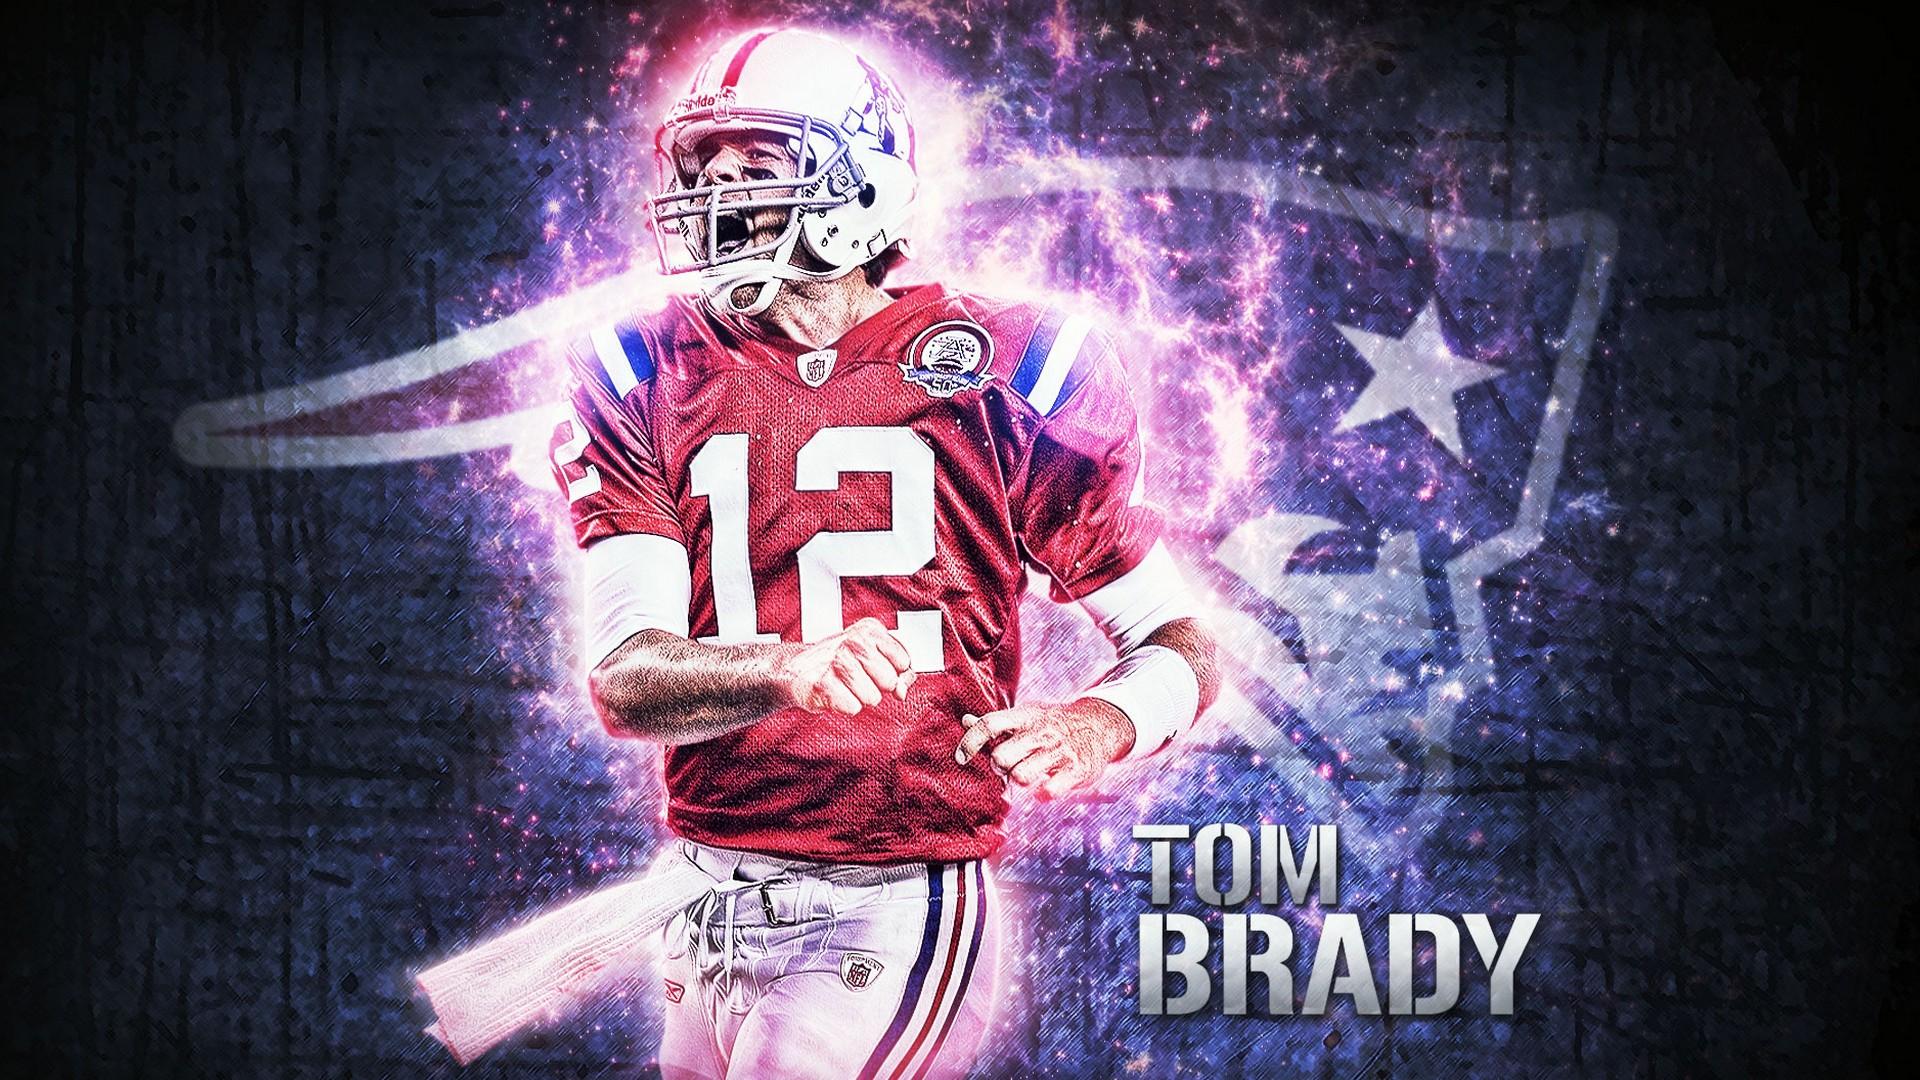 Adrian Peterson Wallpaper Iphone Tom Brady Wallpaper Hd 2020 Live Wallpaper Hd